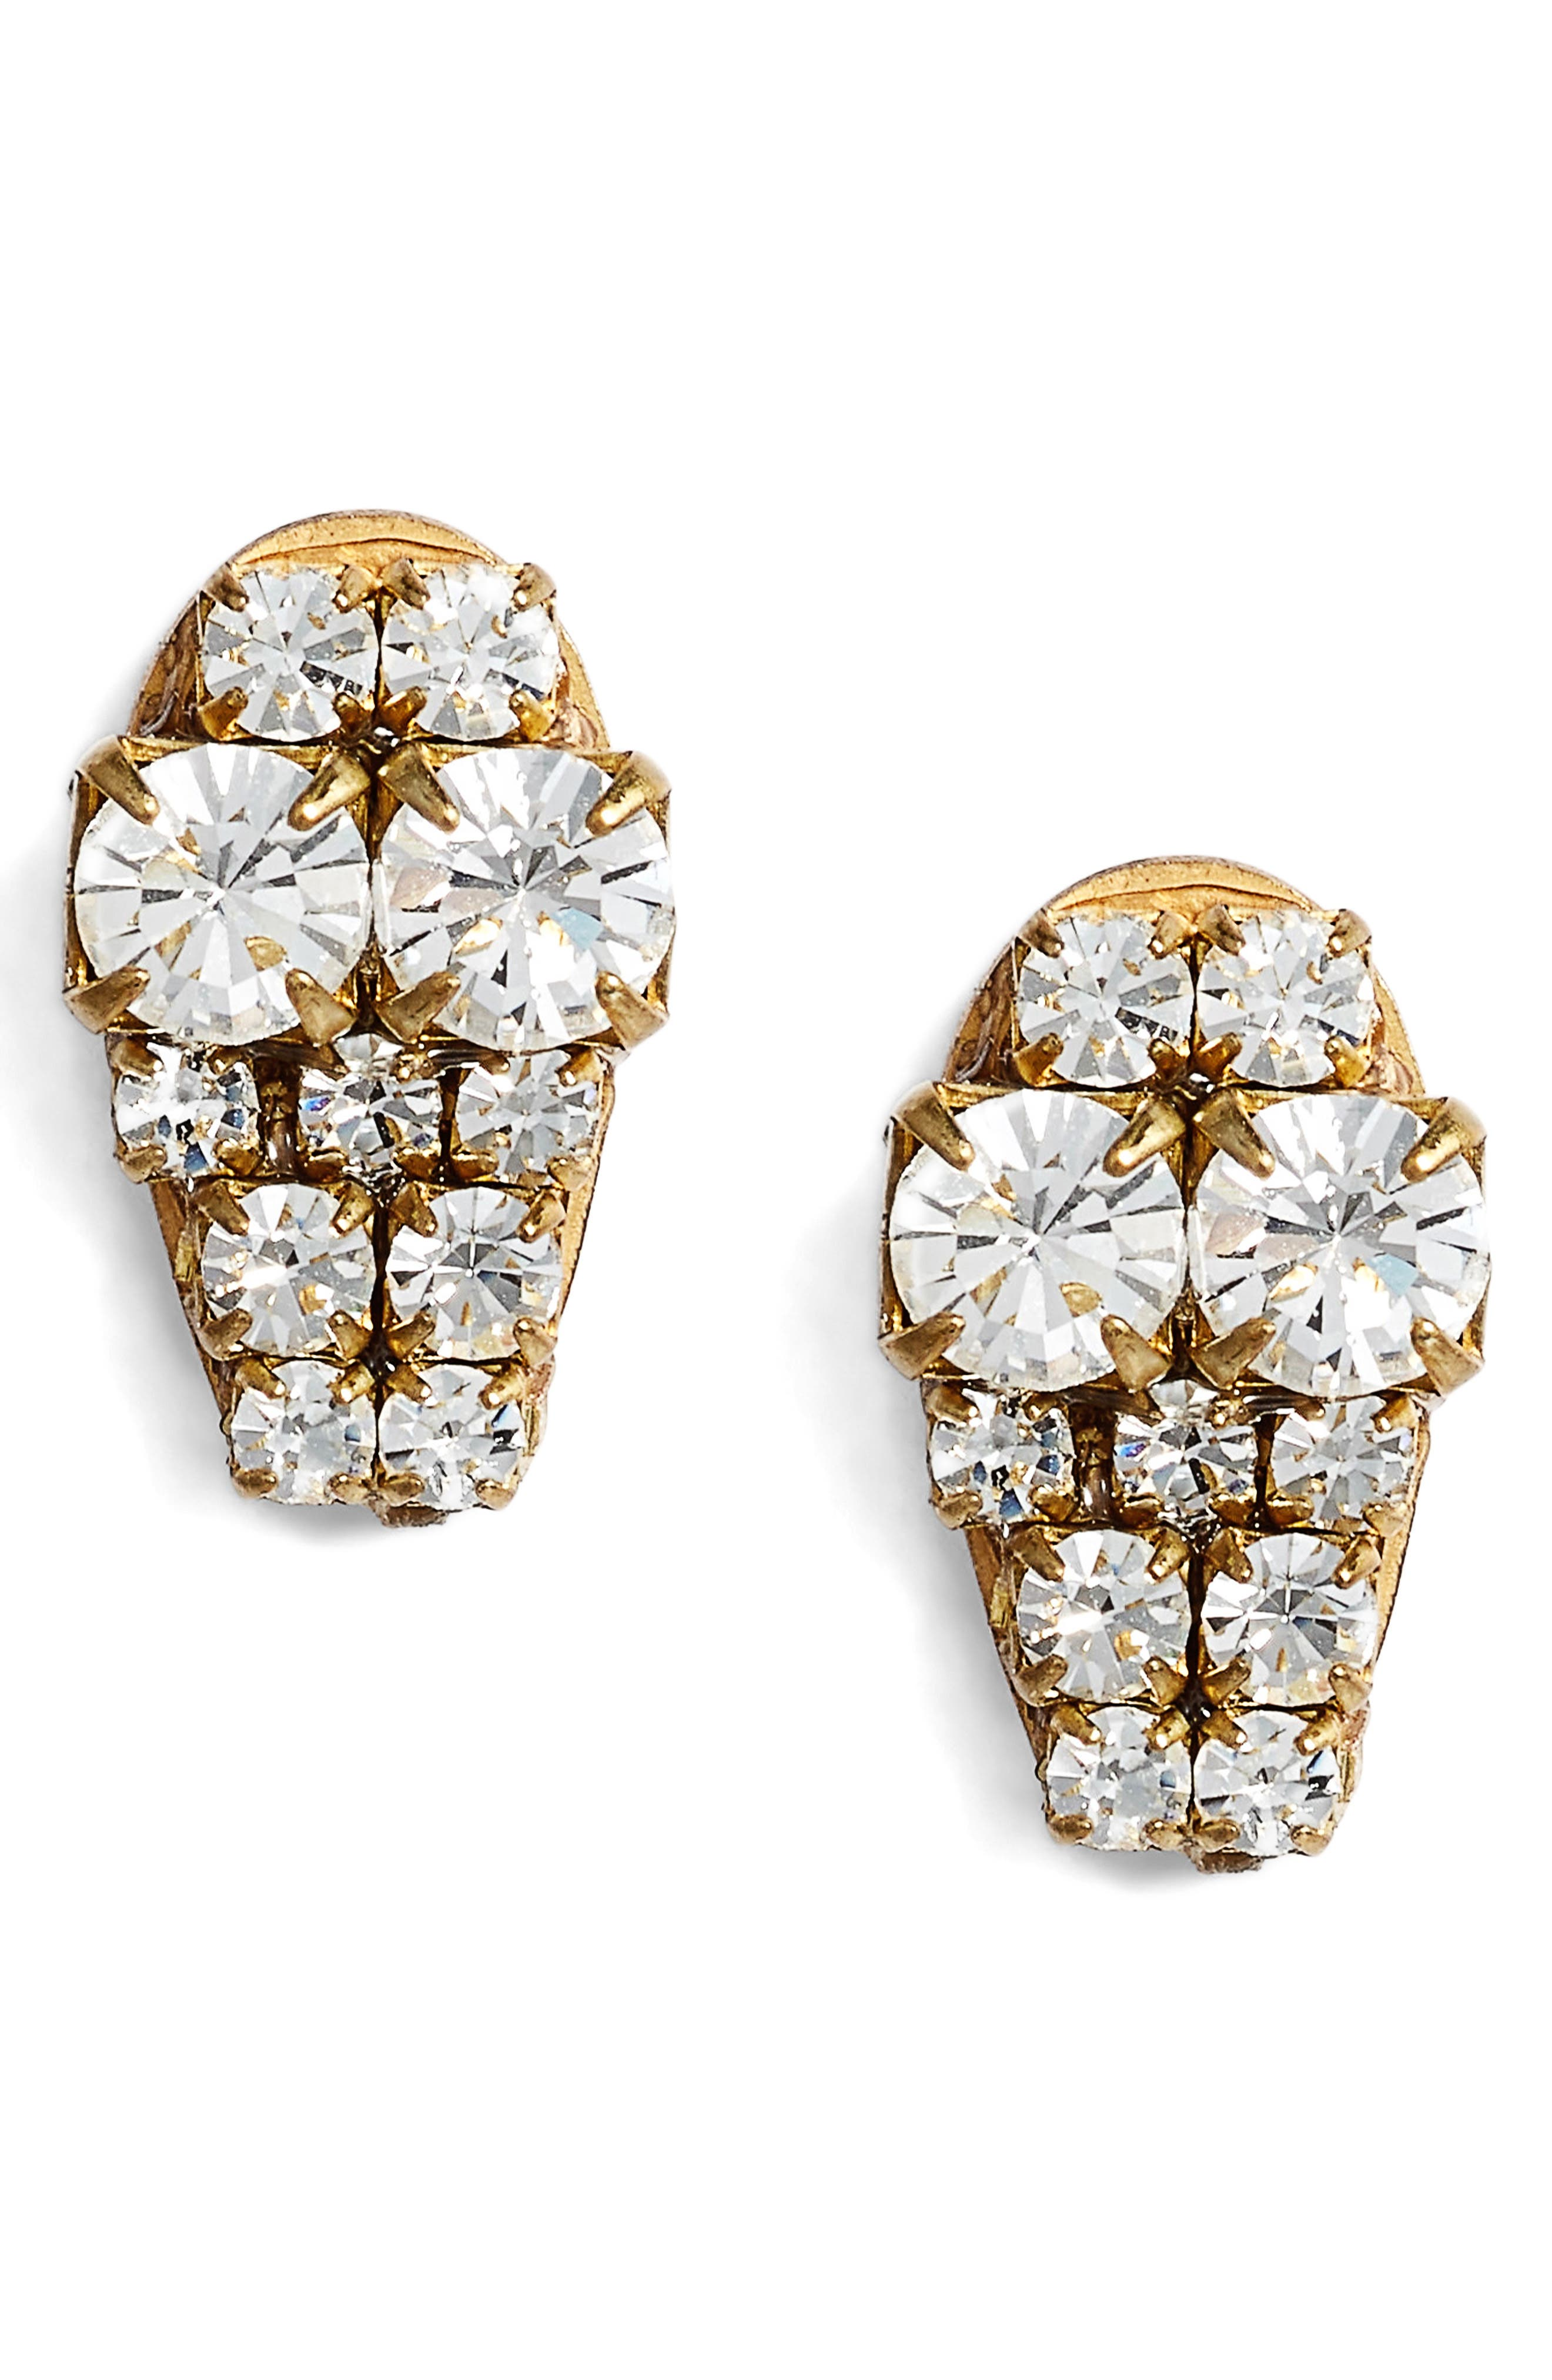 Graduated Crystal Stud Earrings,                         Main,                         color, Crystal/ Gold